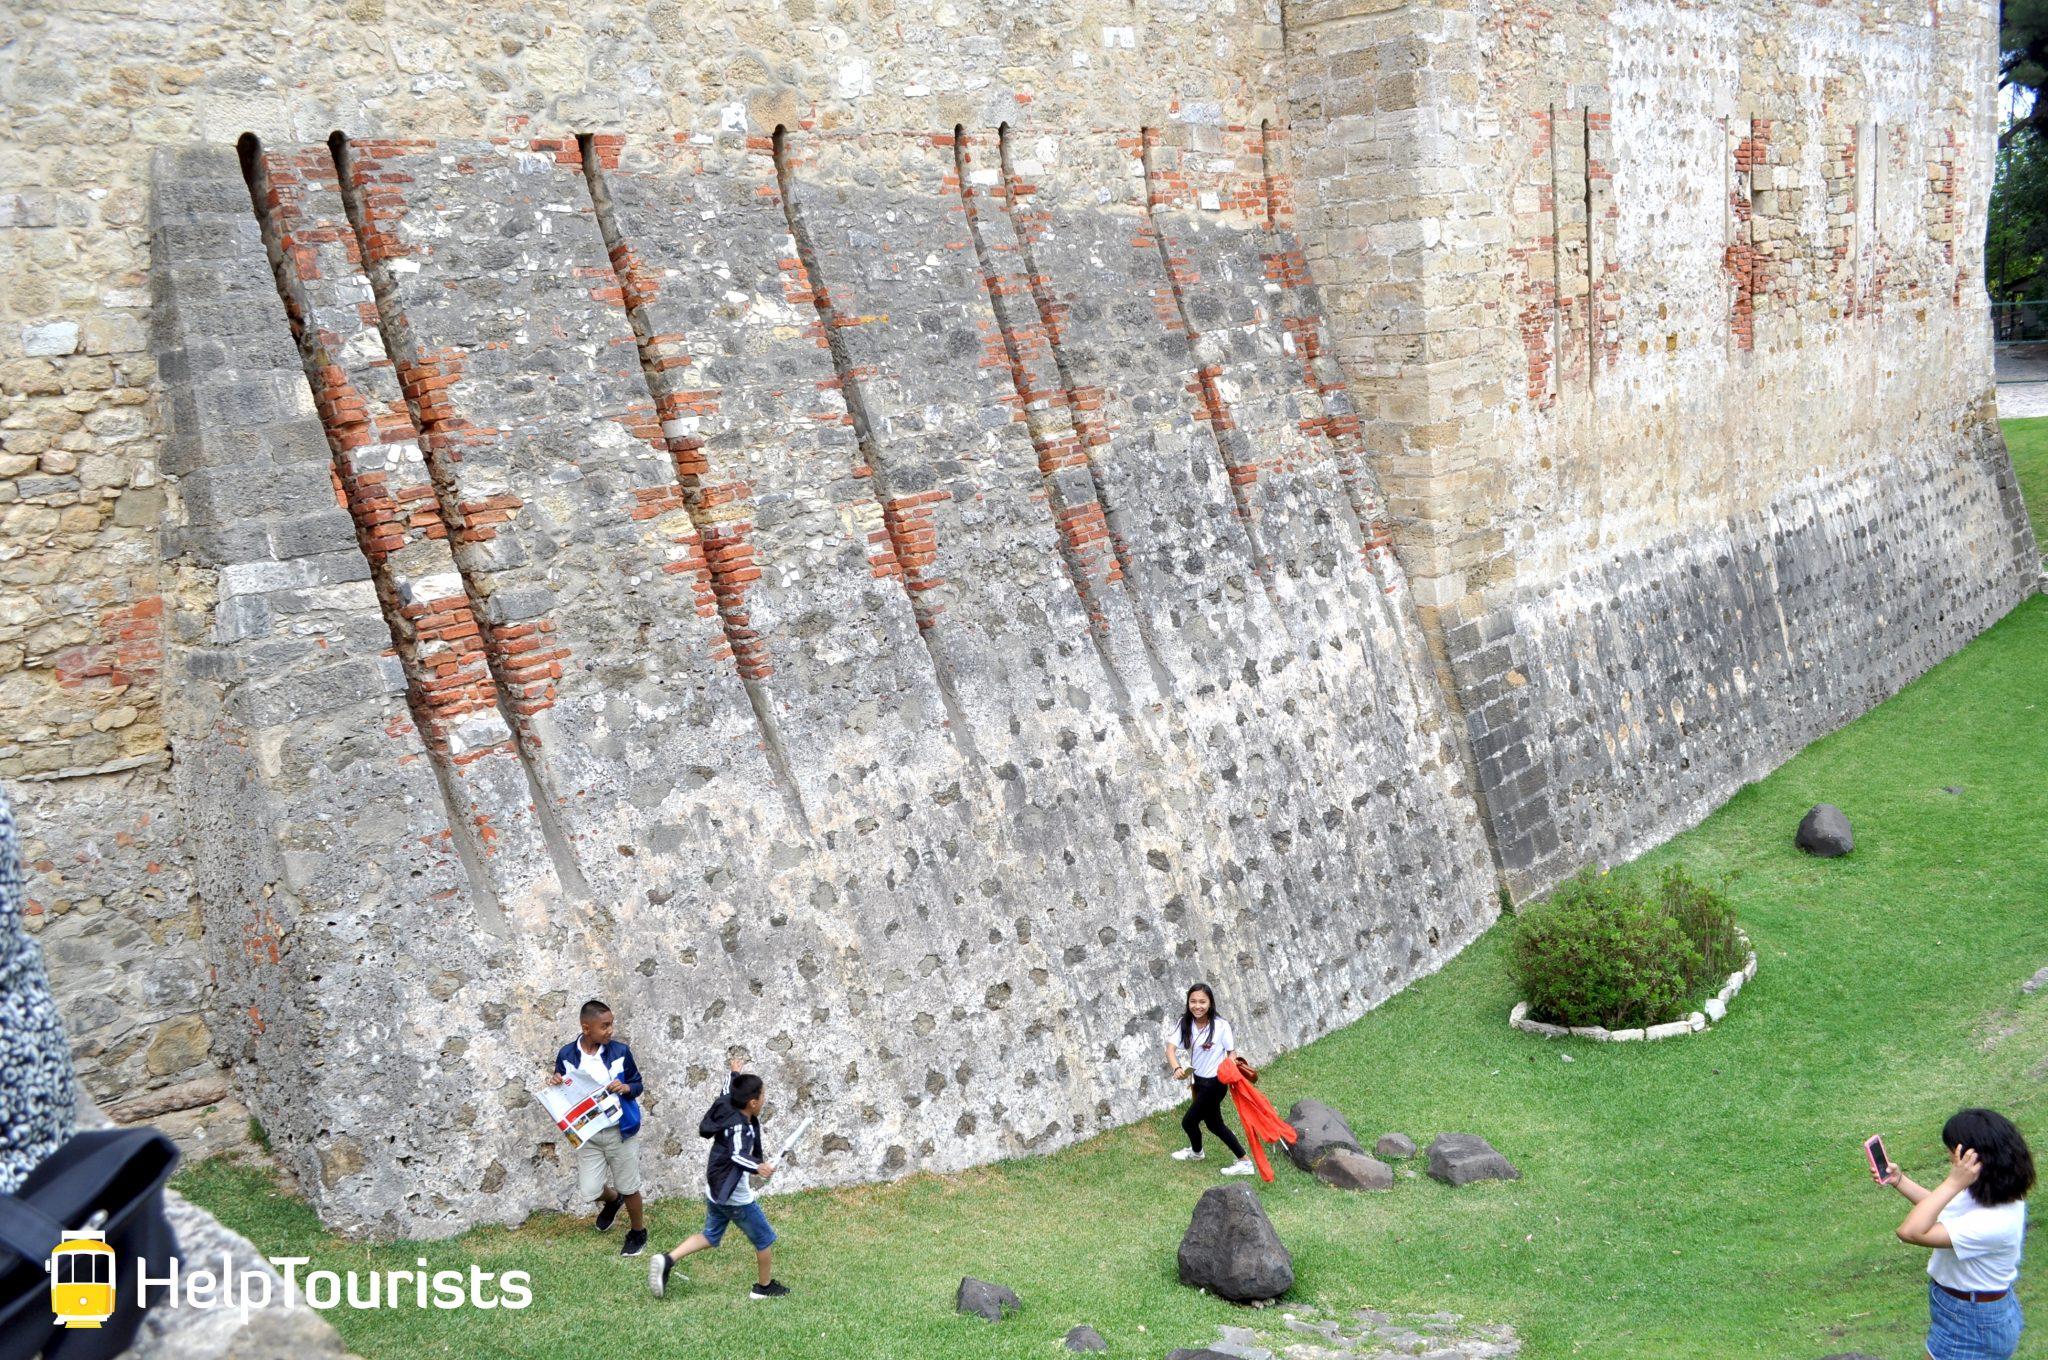 Lissabon castelo de sao jorge kinder